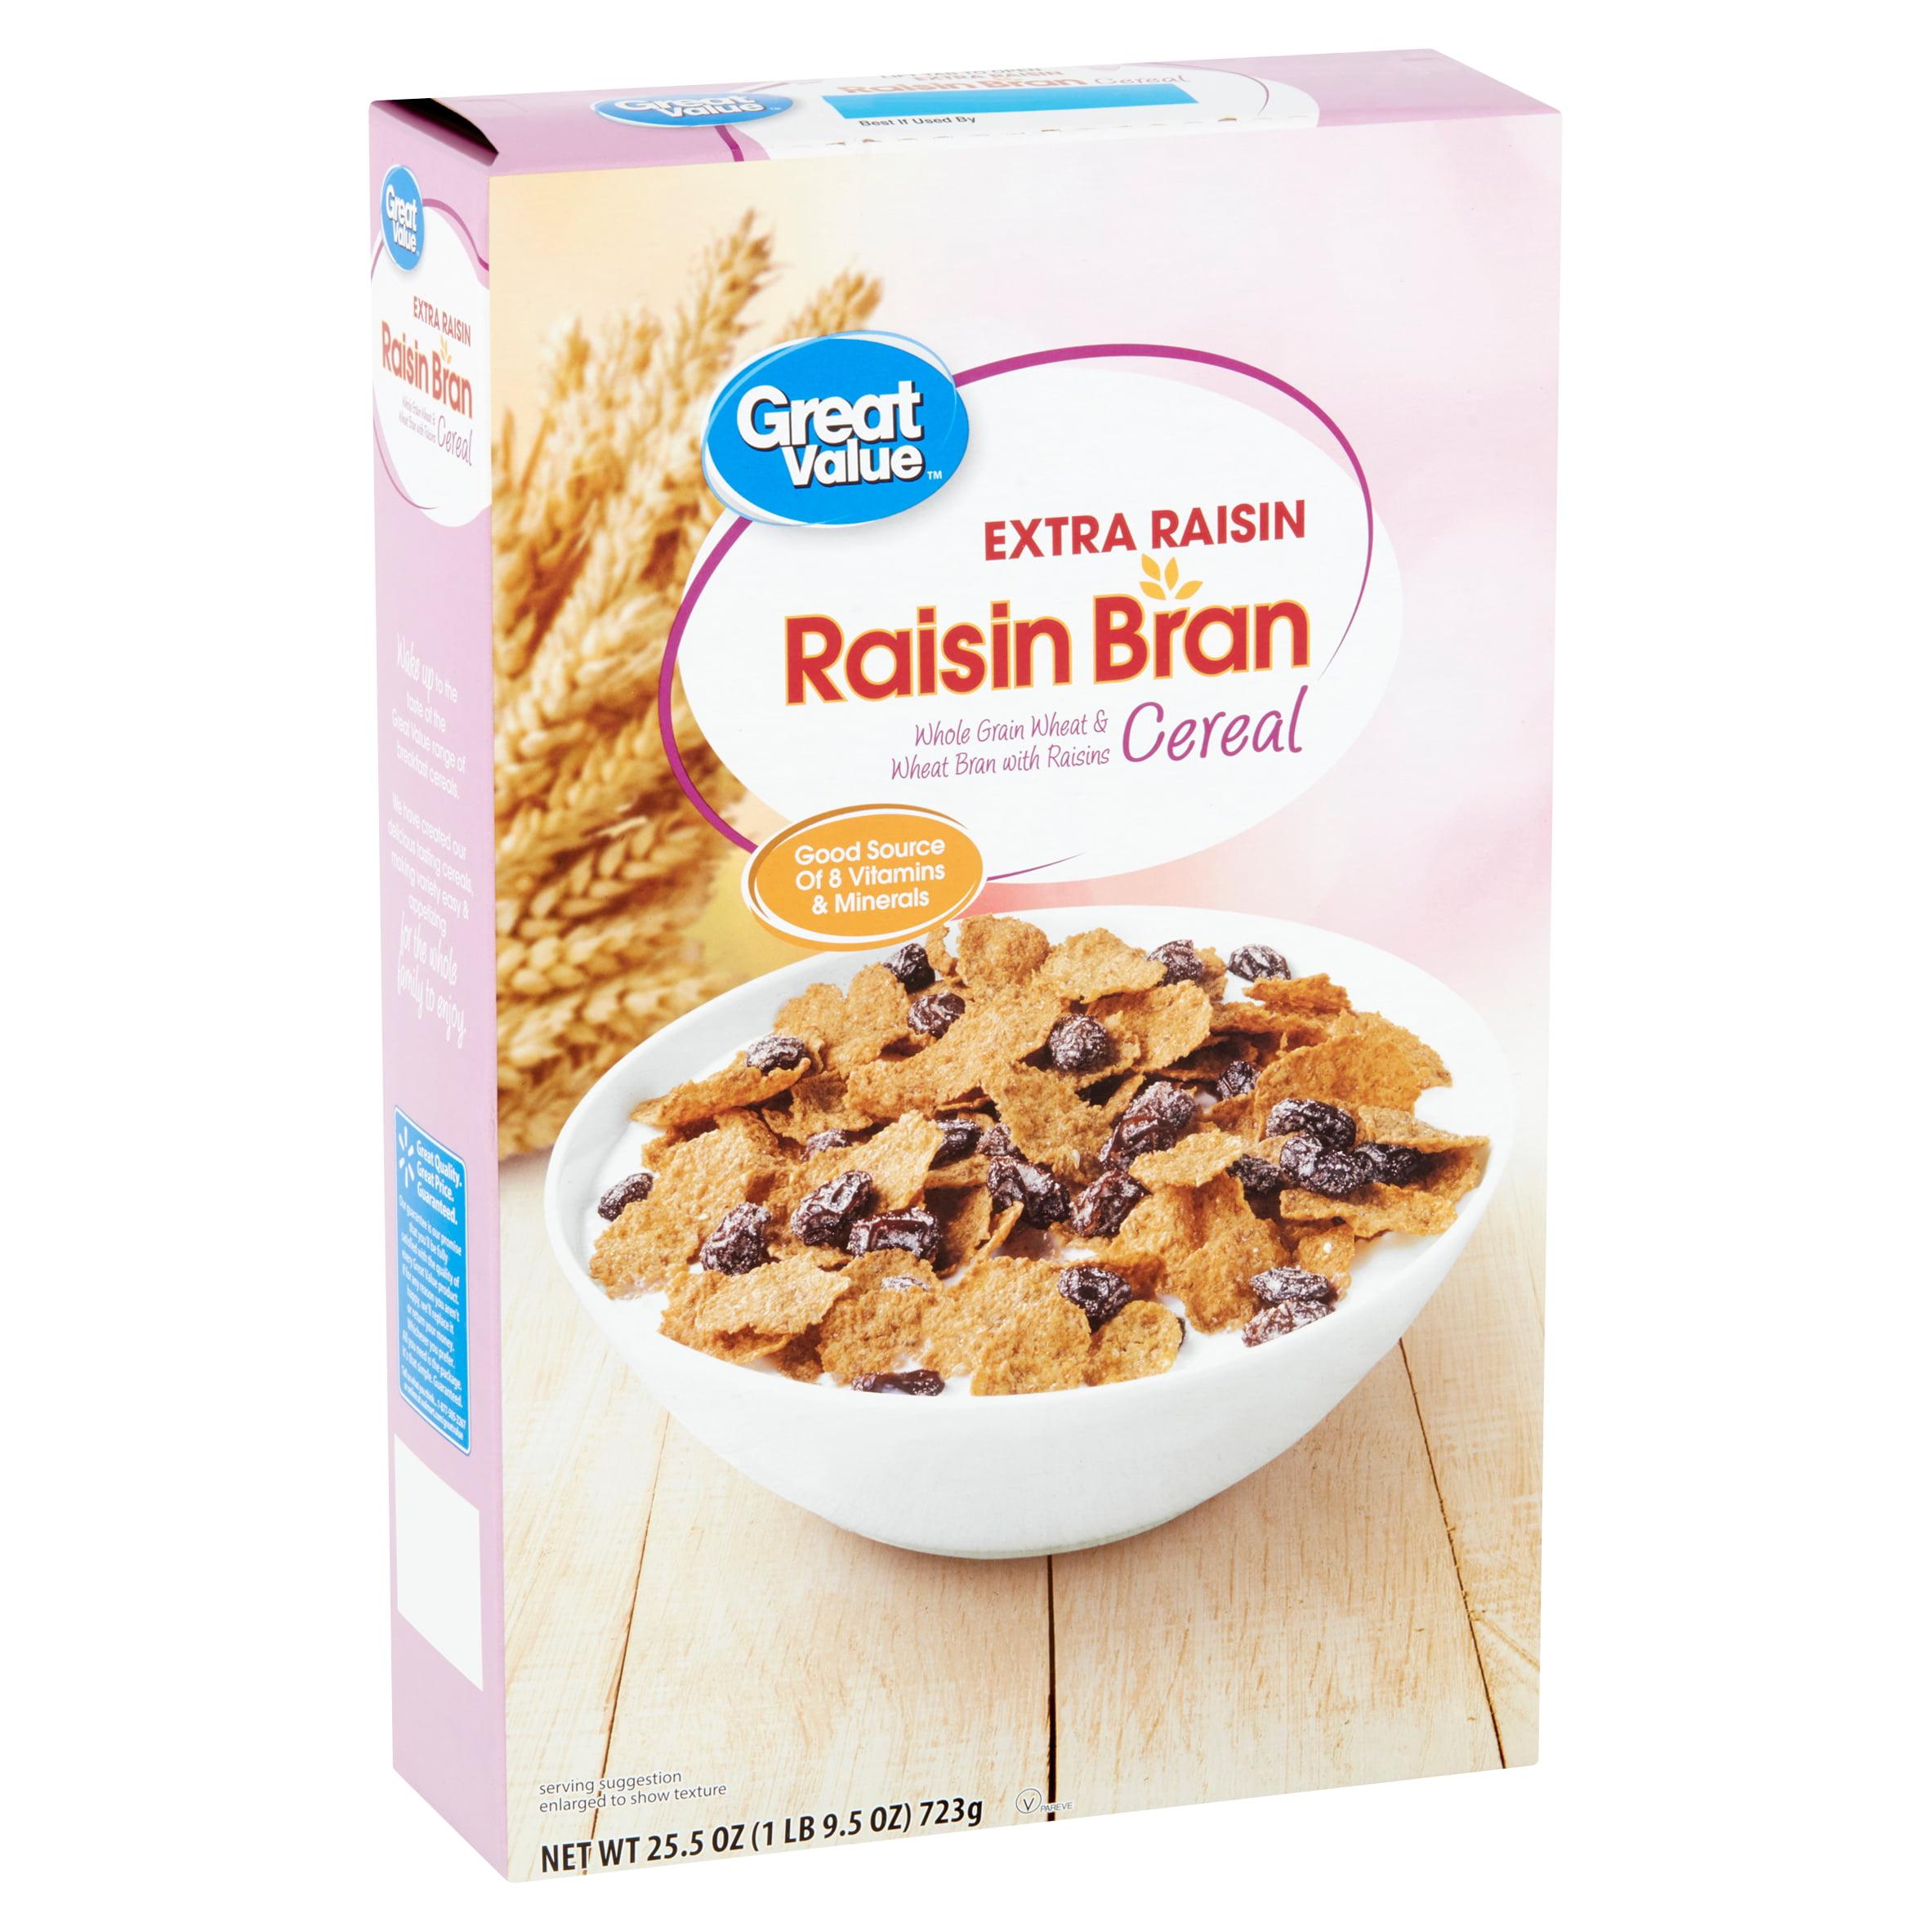 Great Value Raisin Bran Extra Raisin